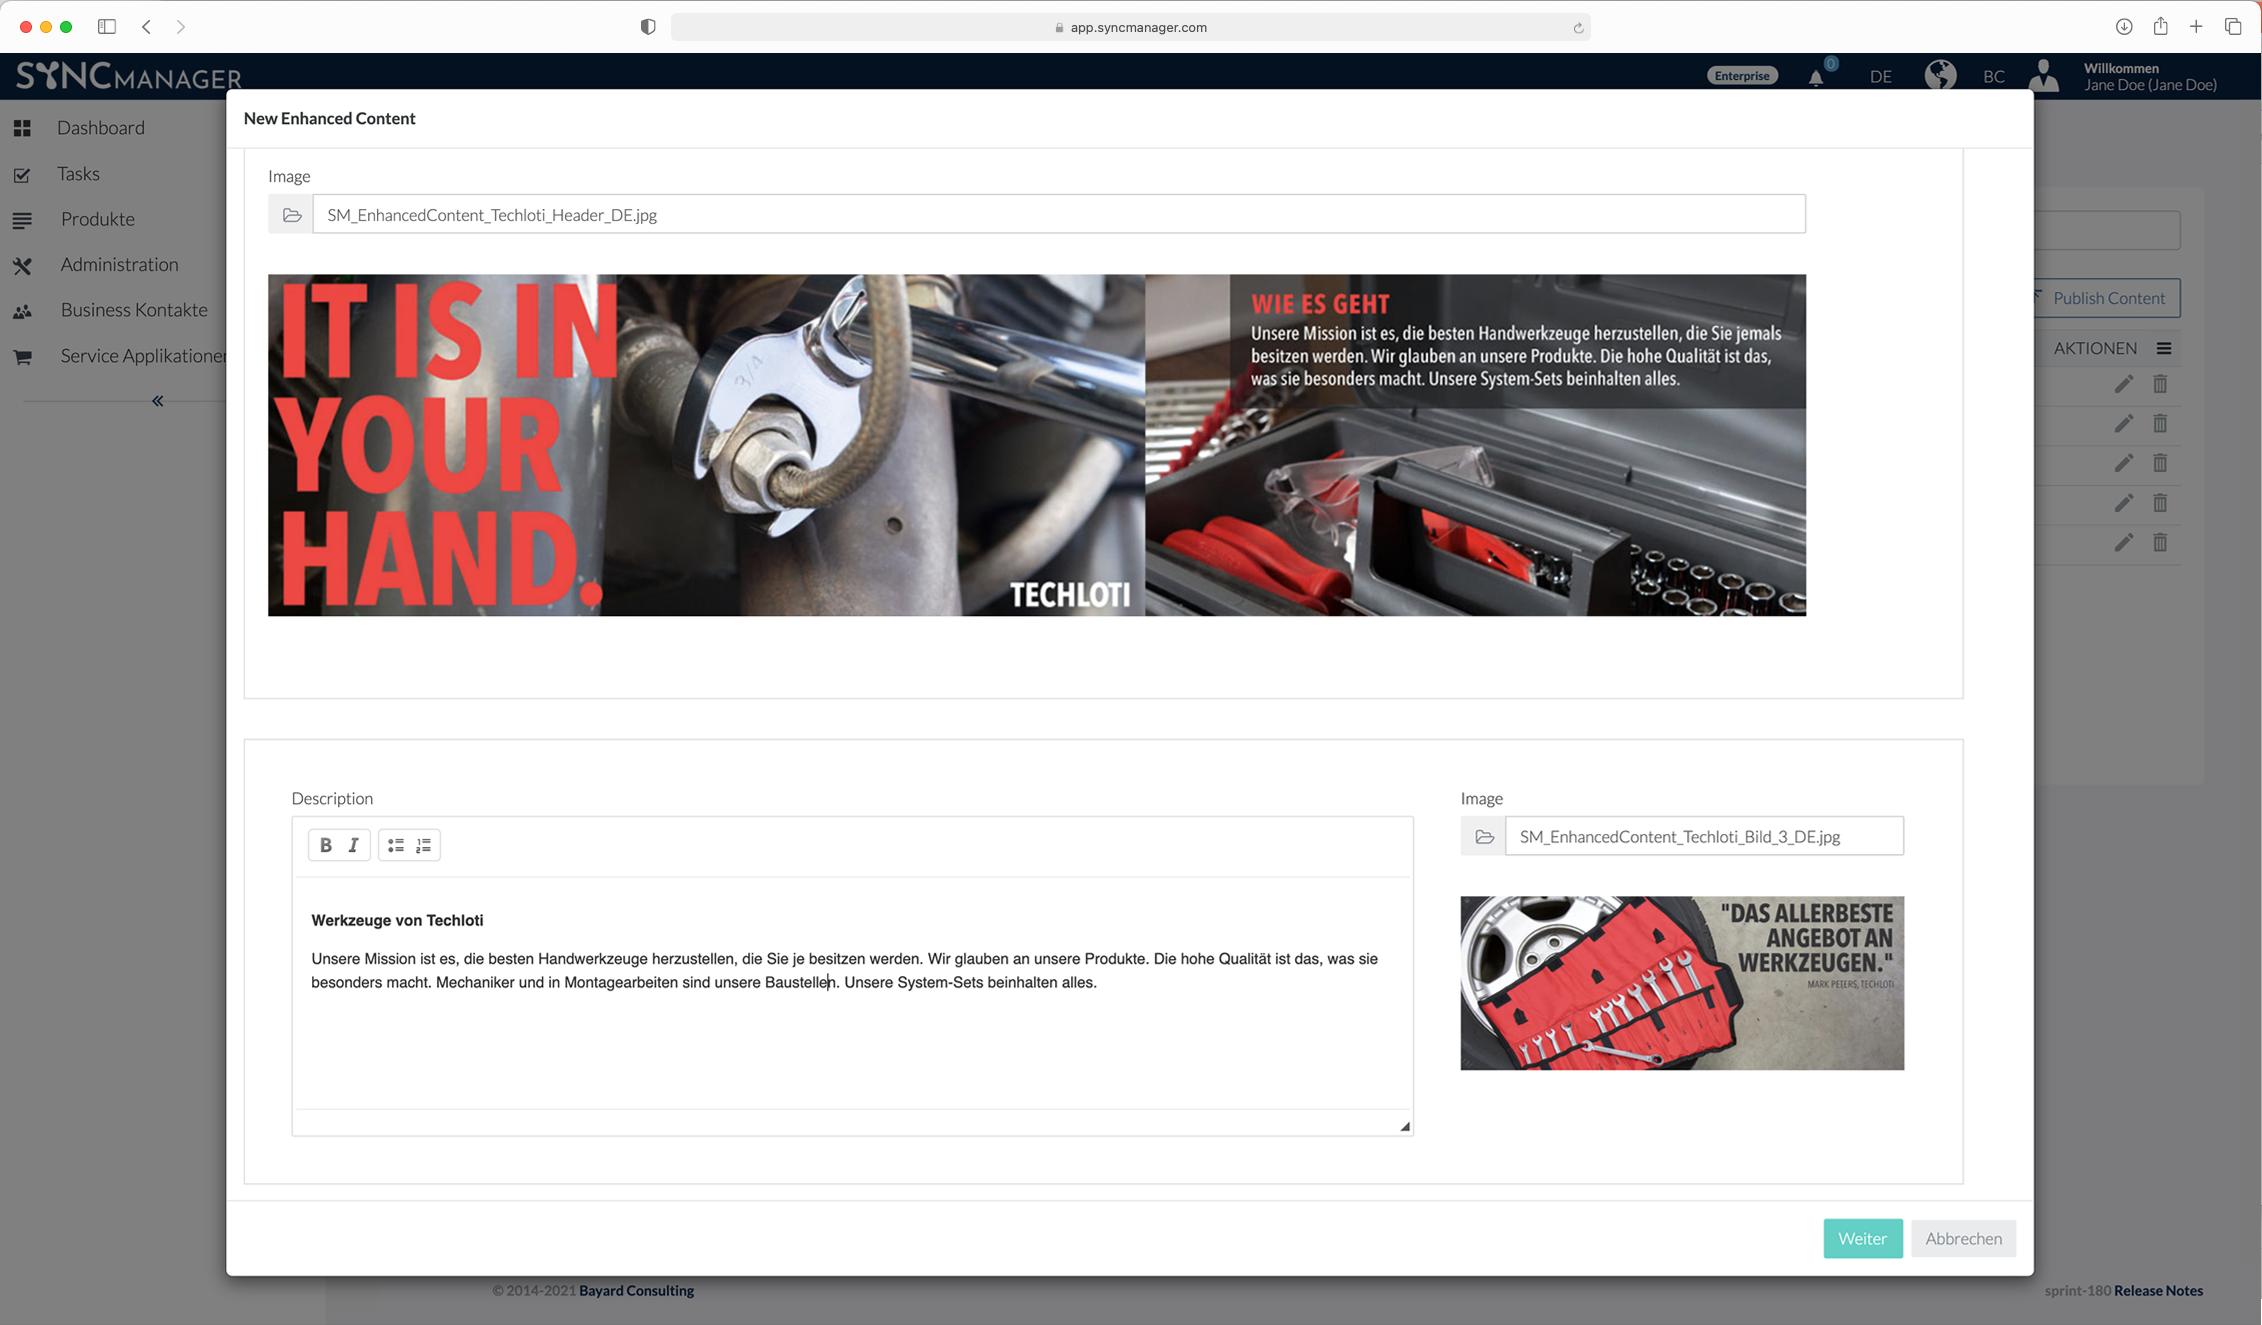 SyncManager – Produkt-Webshop-Detailseiten für Lieferanten – Enhanced Content – DIY